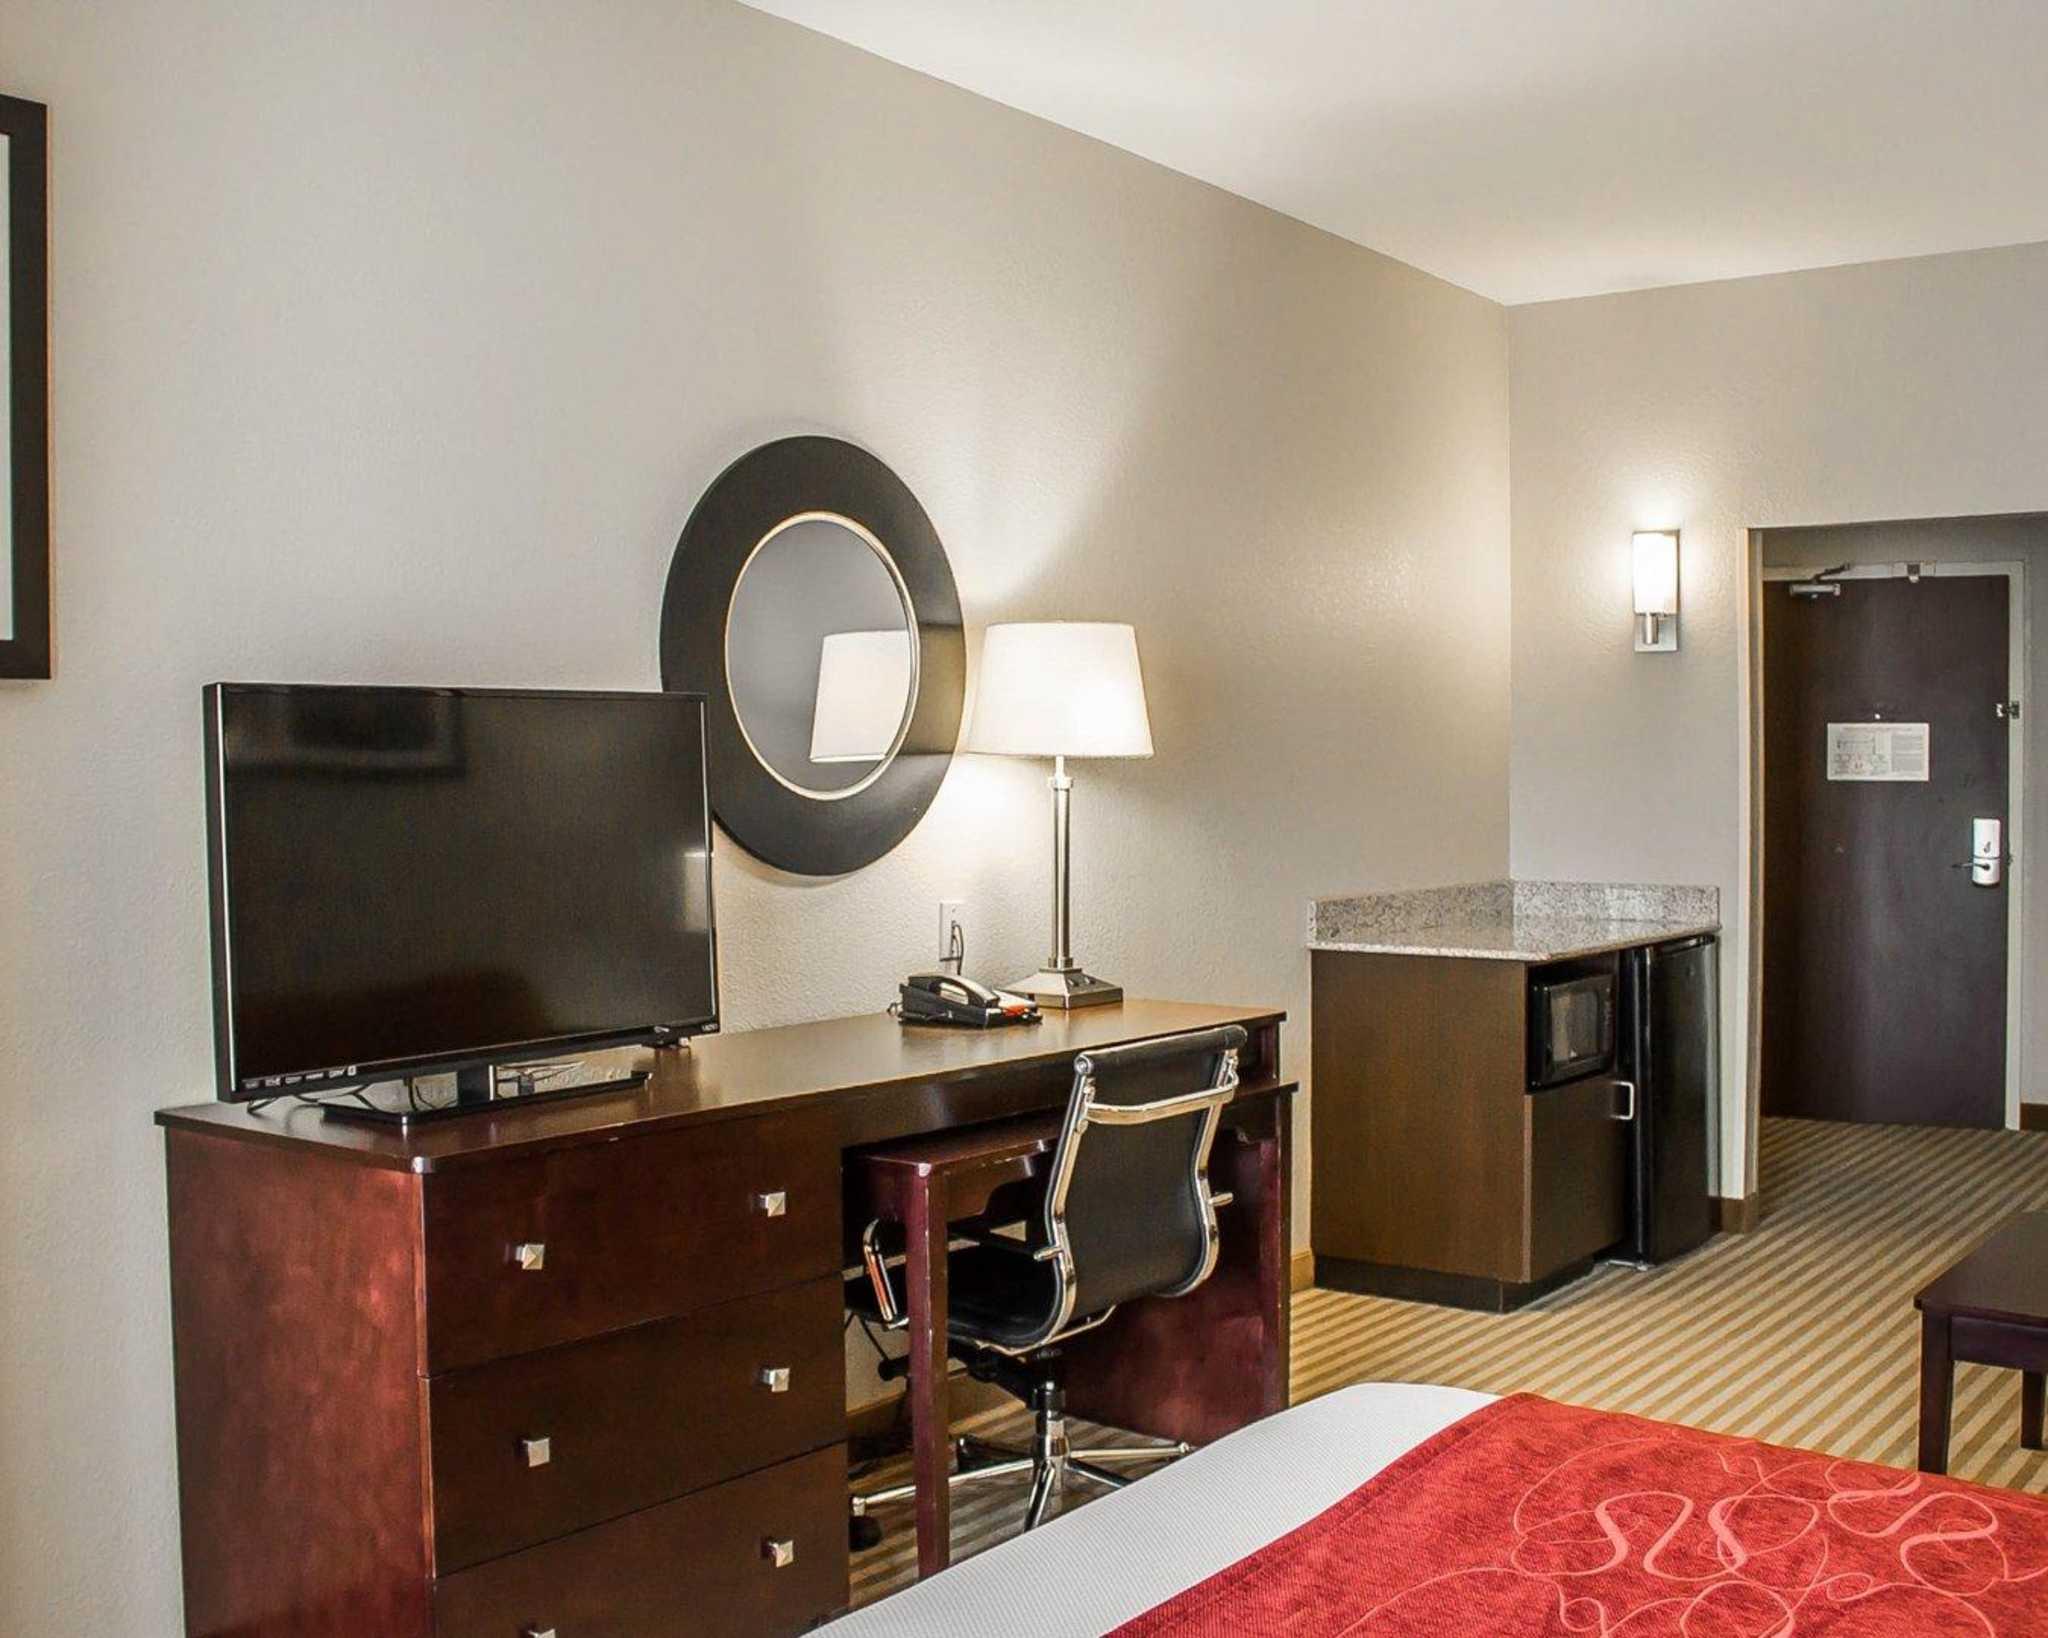 Comfort Suites East Broad at 270 image 7